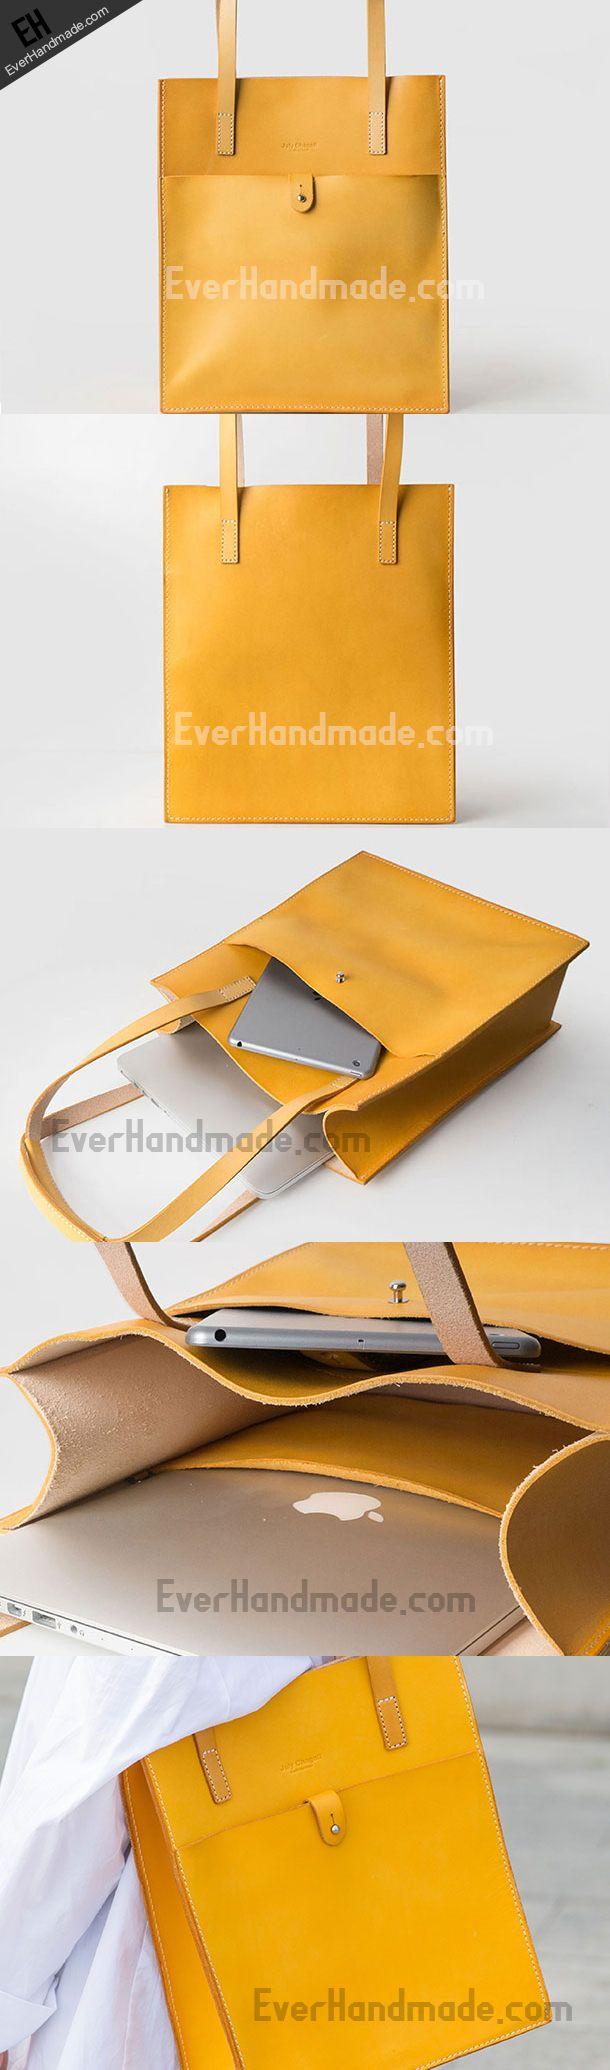 Handmade Leather handbag shoulder tote bag yellow red brown for